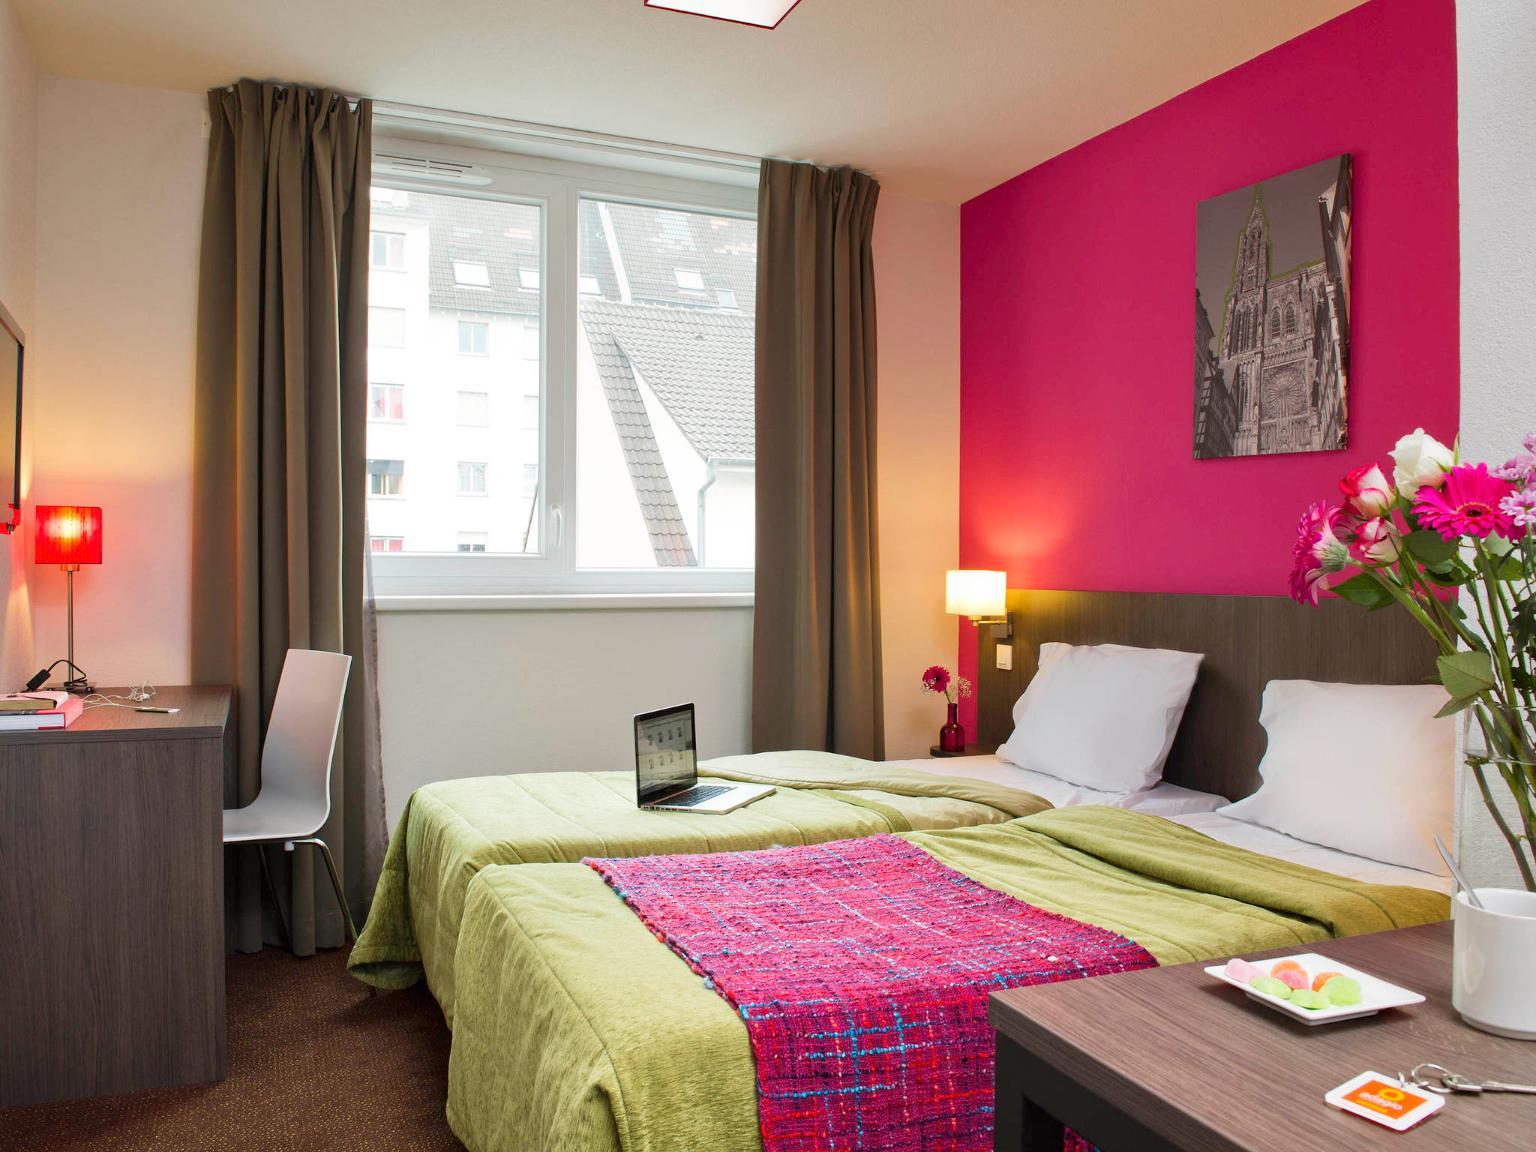 aparthotel adagio access strasbourg petite france h tel. Black Bedroom Furniture Sets. Home Design Ideas